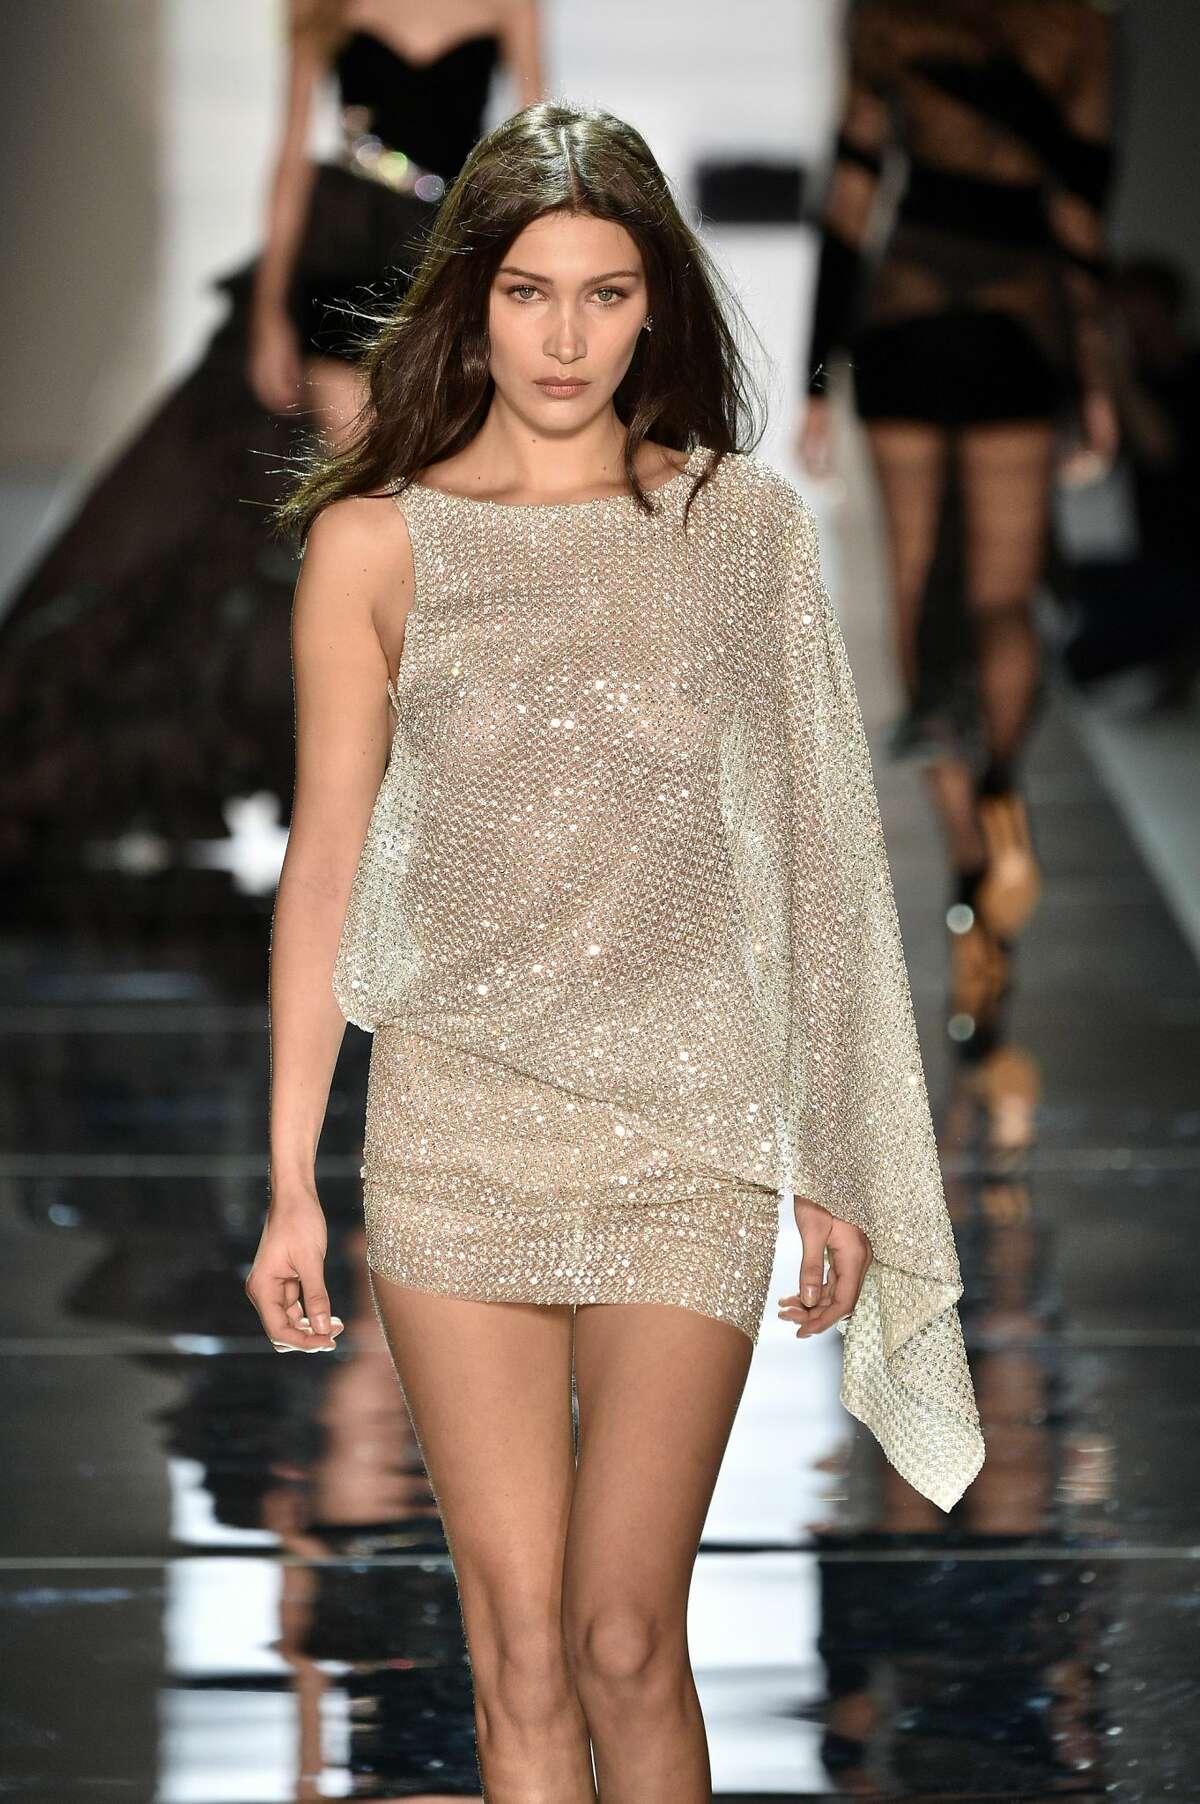 Bella Hadid walks the runway during the Alexandre Vauthier Spring Summer 2017 show in Swarovskicrystal dress.